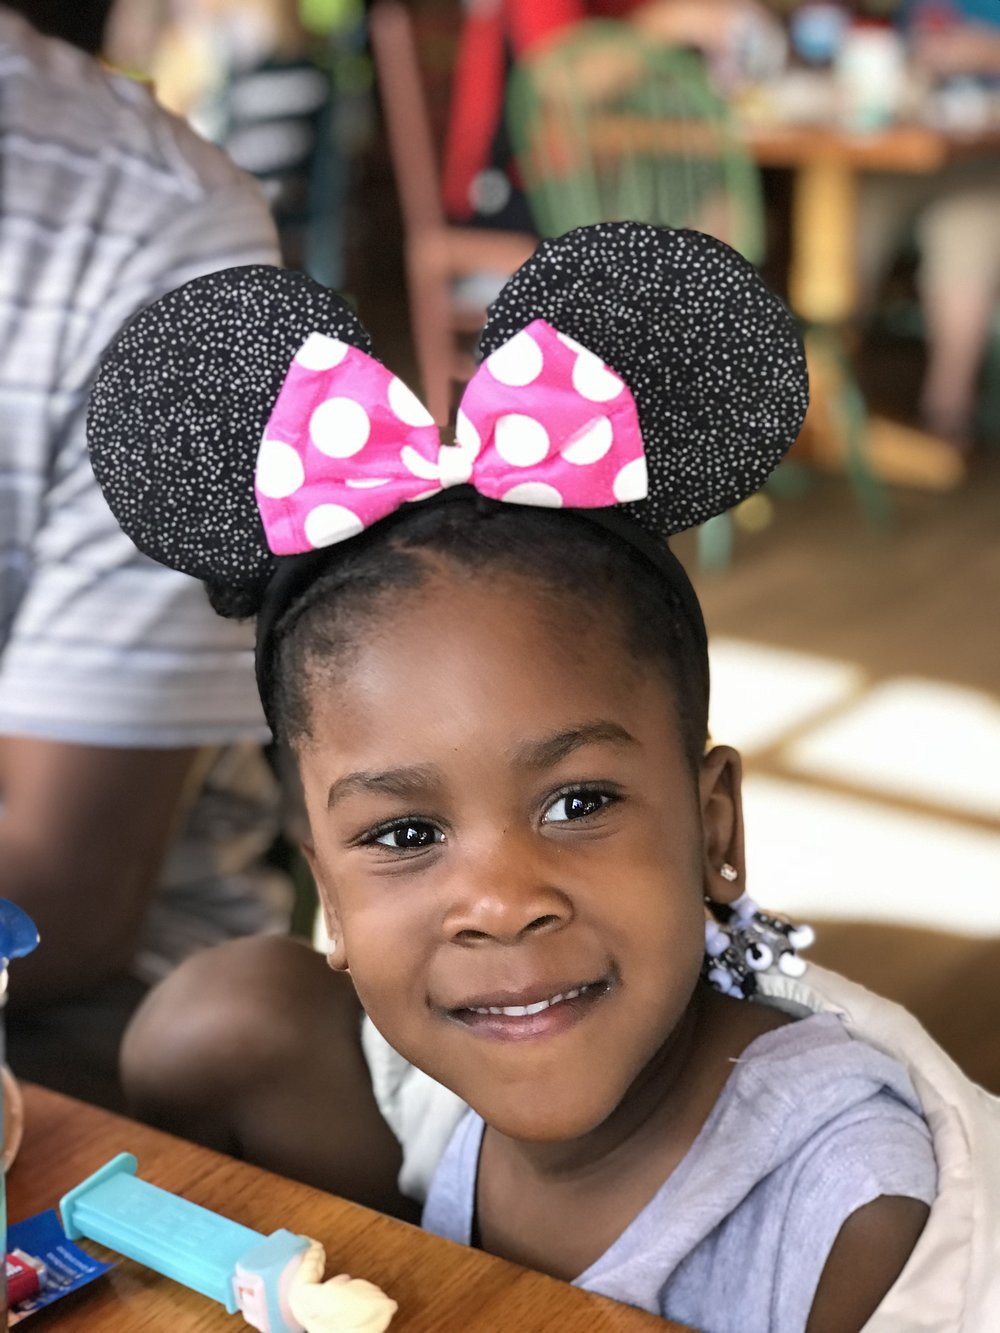 Aria With Mickey Ears .jpg